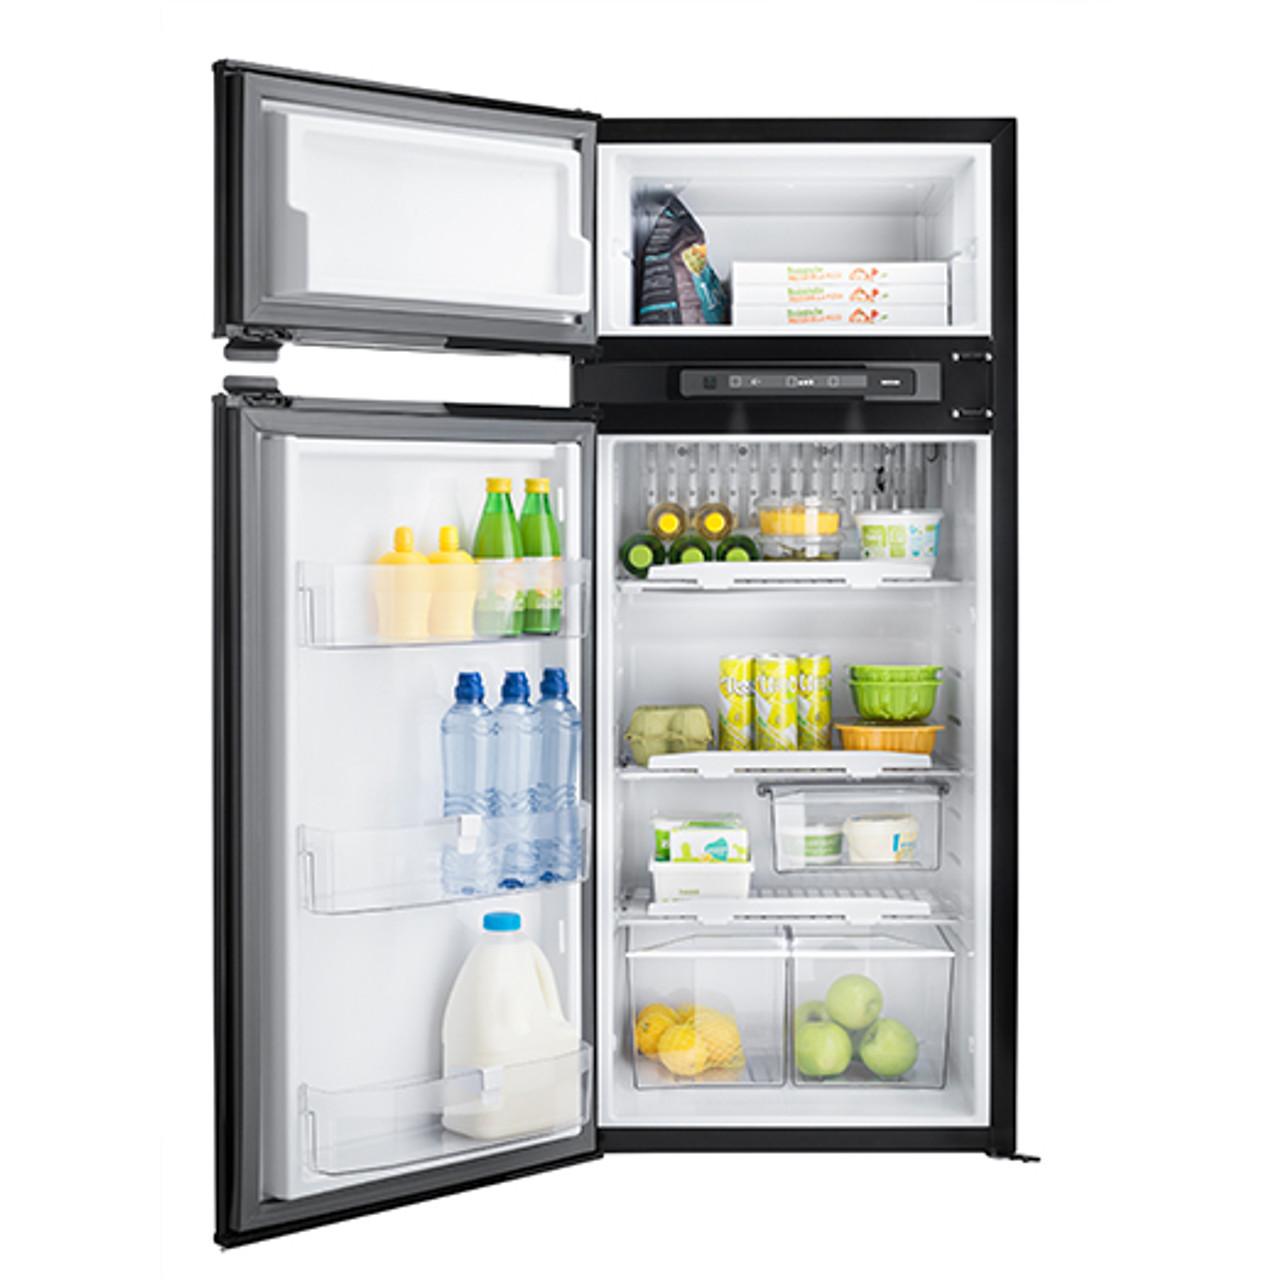 Interior of Thetford N4175 Fridge Freezer